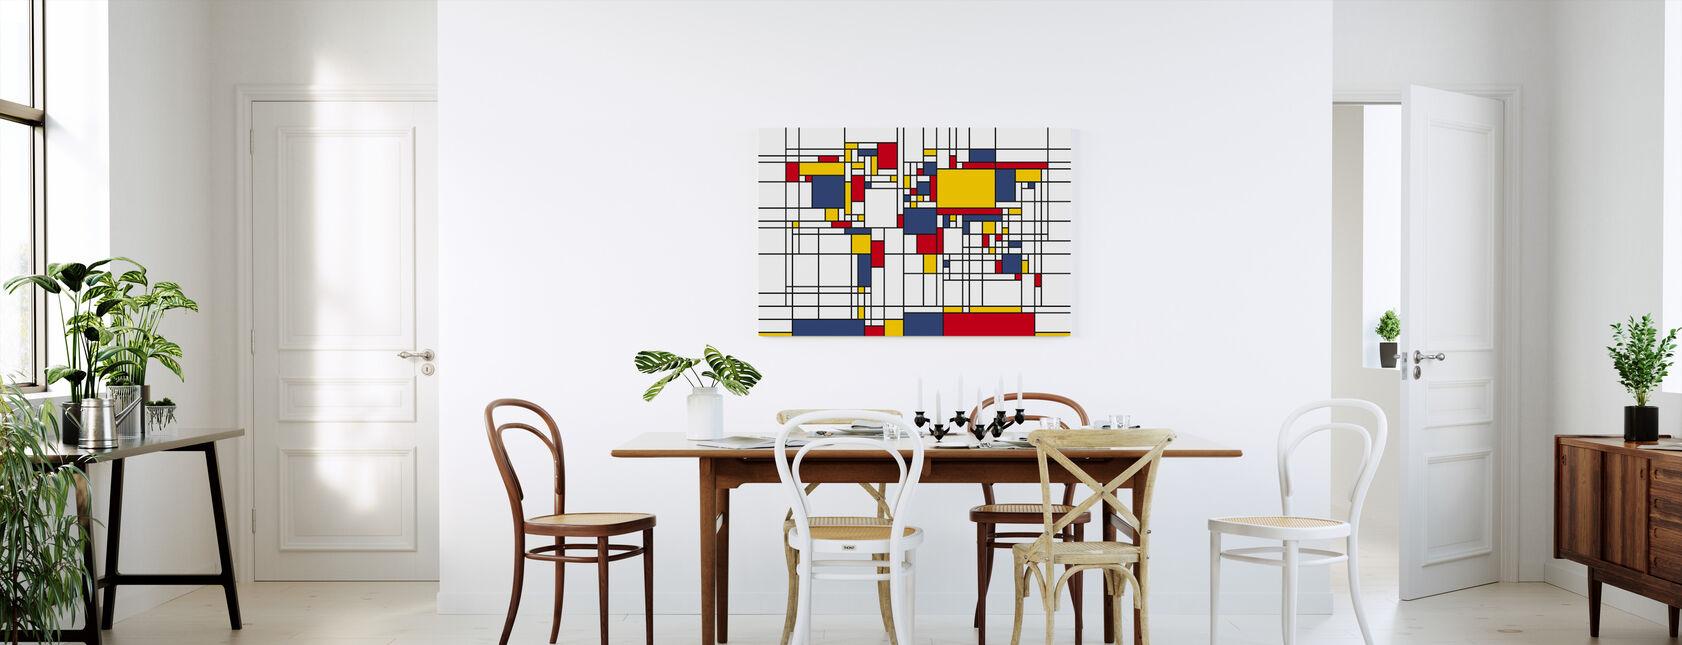 Piet Mondrian Style Mapa del Mundo - Lienzo - Cocina